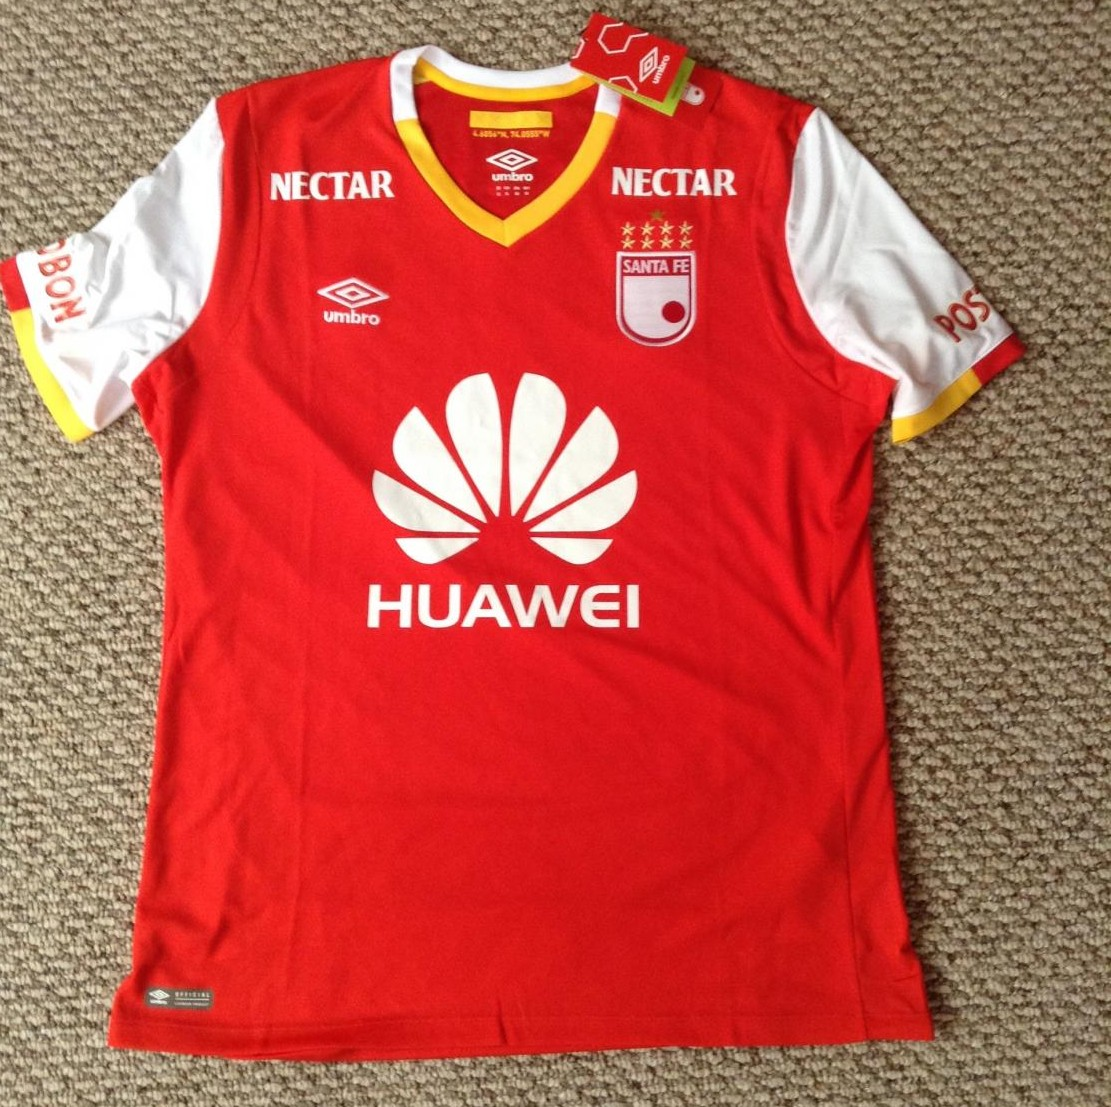 Independiente Santa Fe Home football shirt 2017. 9bcdc4706